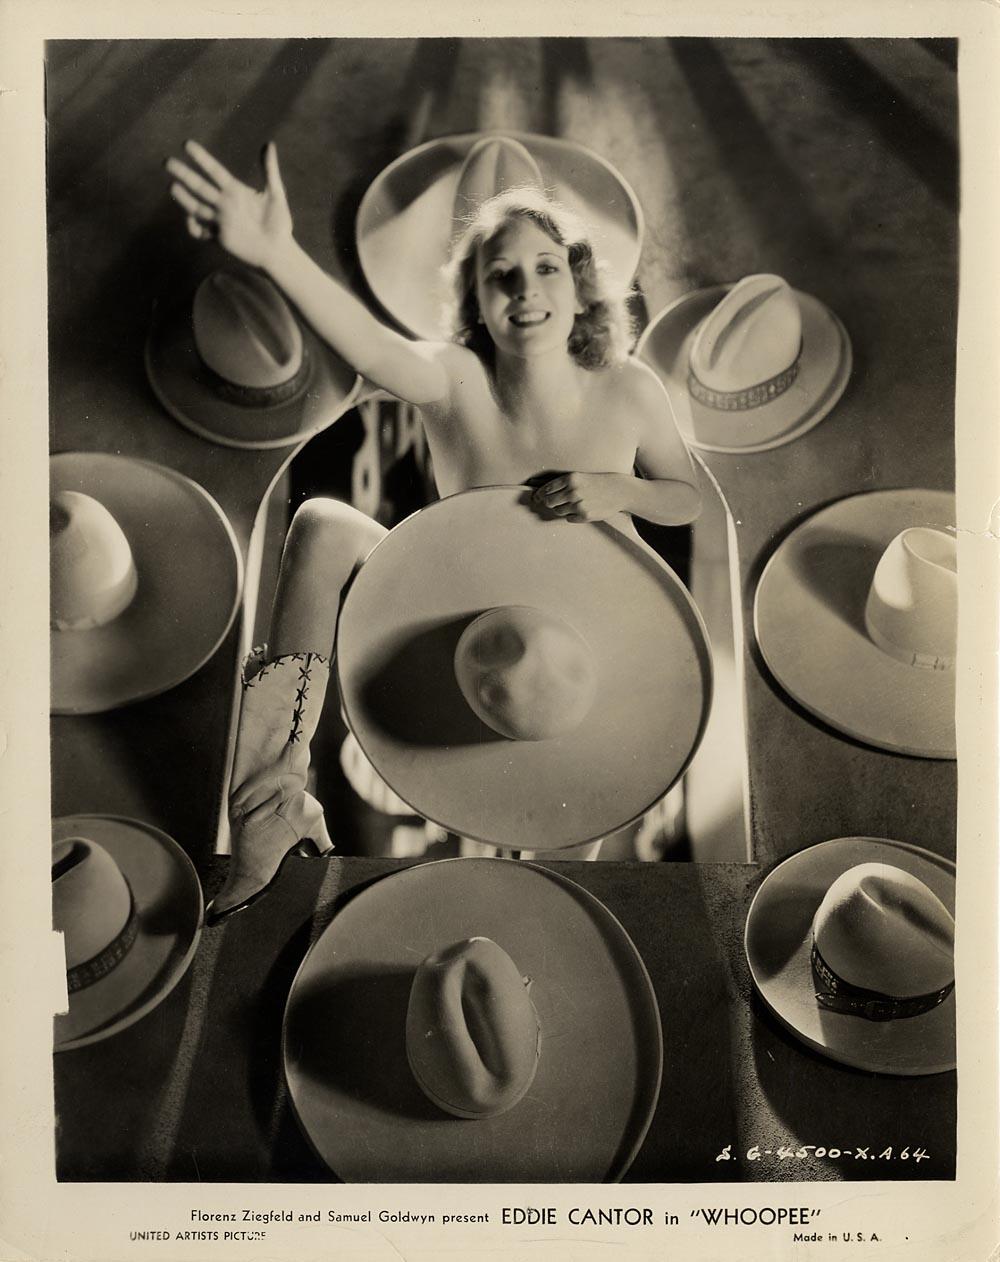 A Ziegfeld Girl